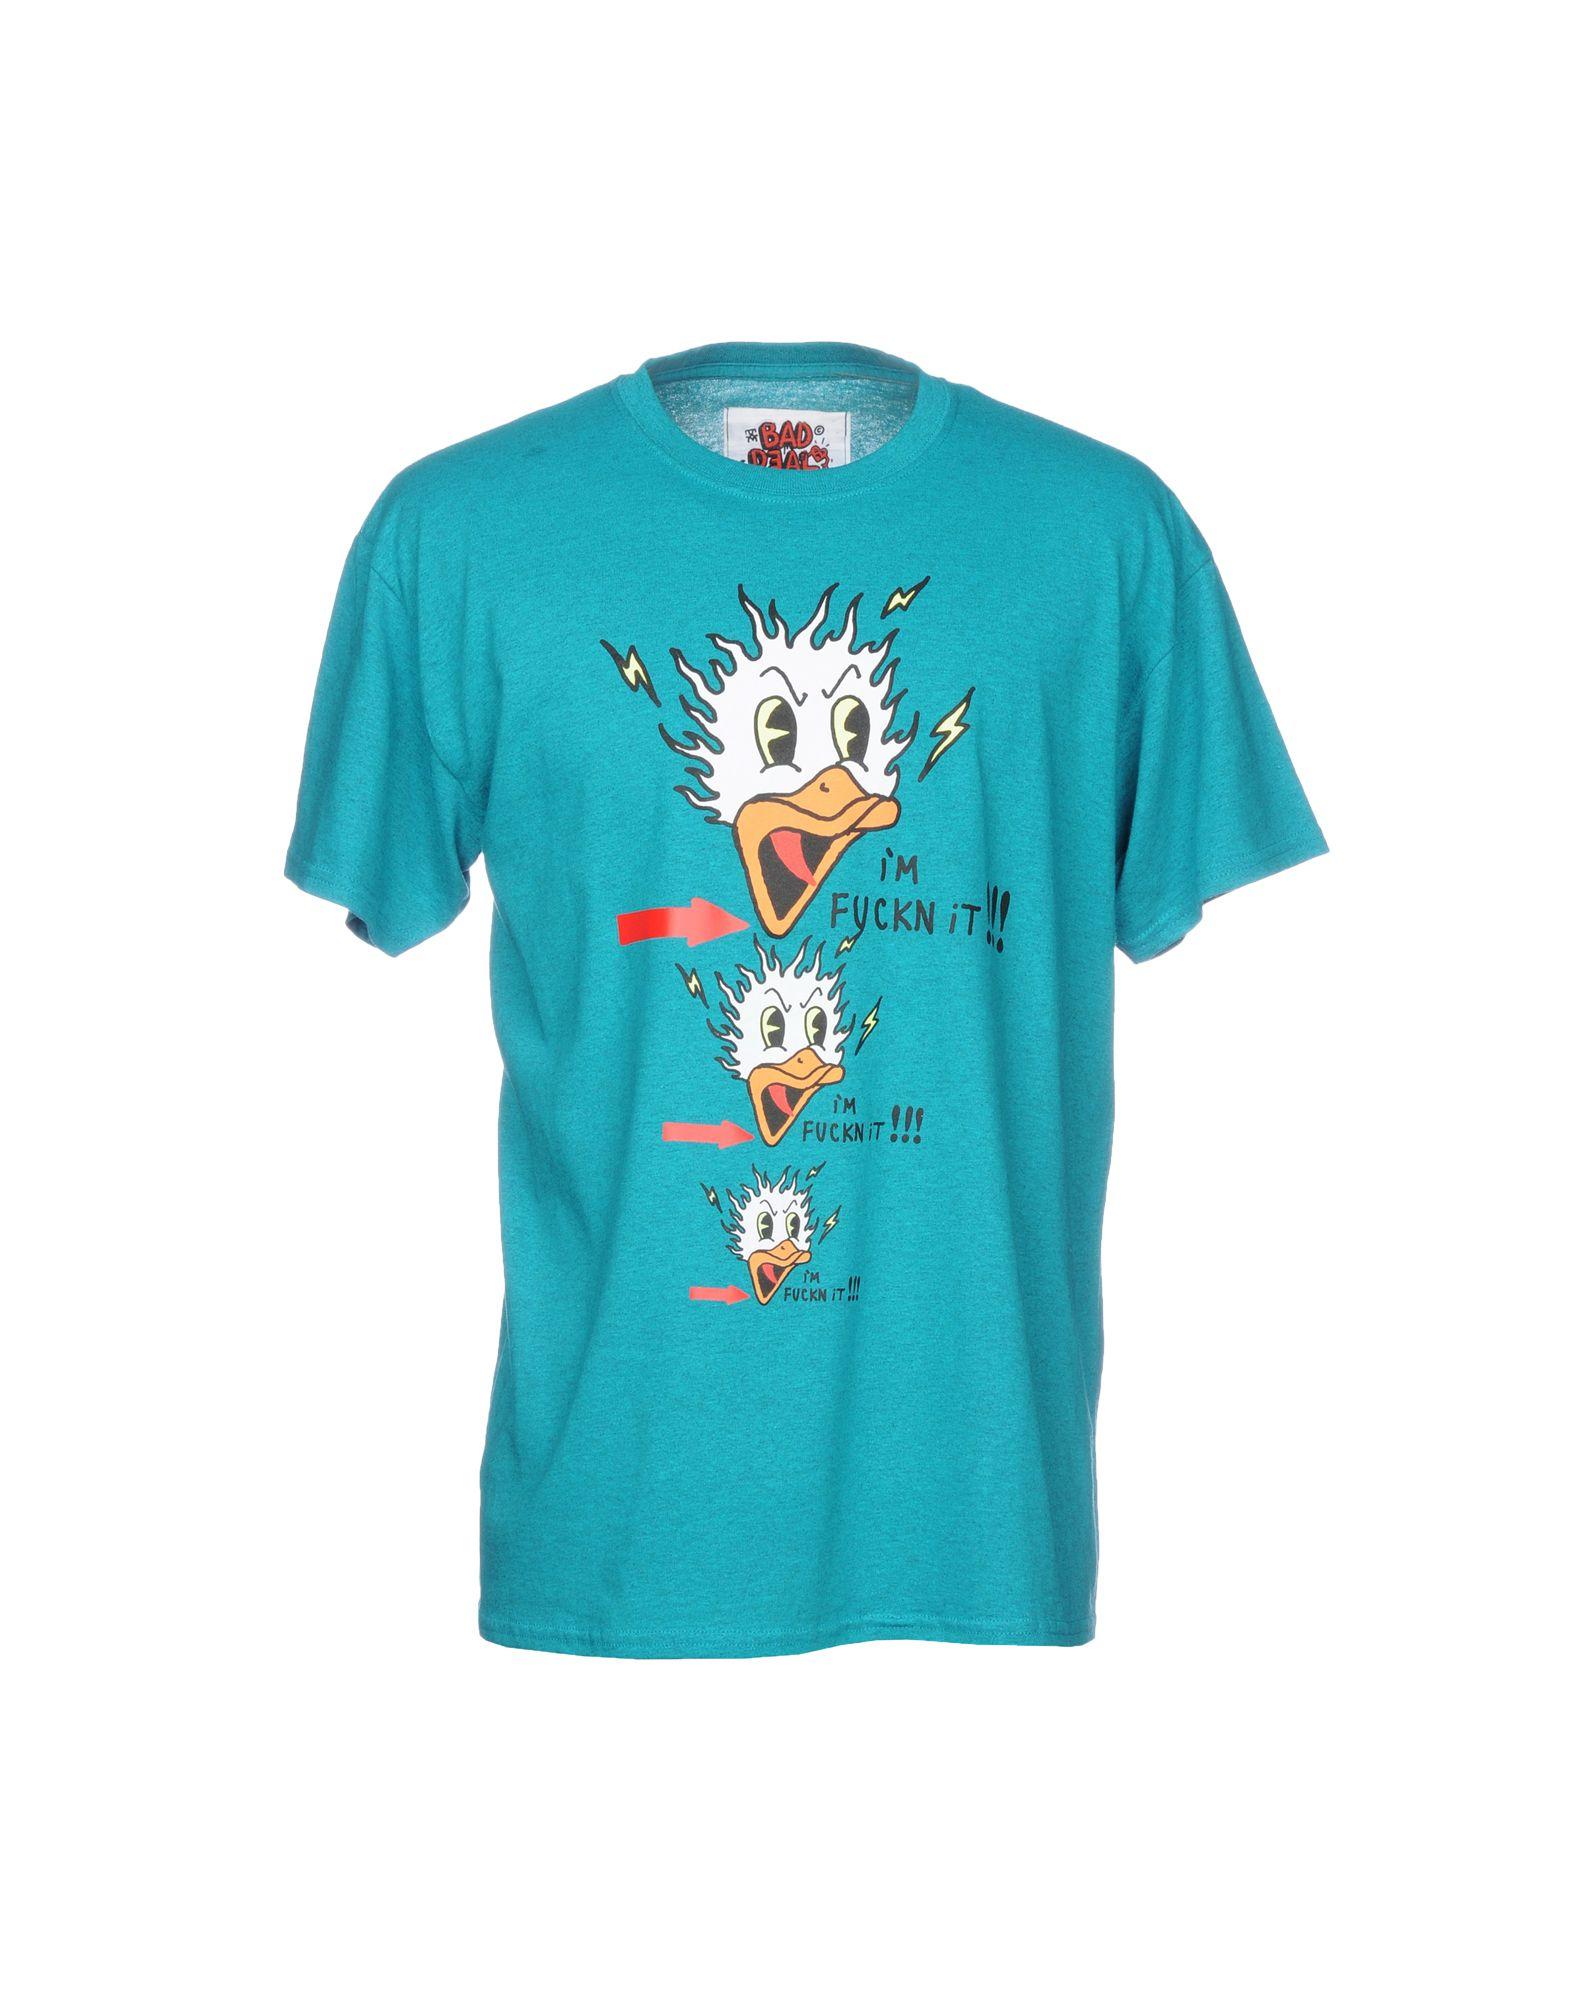 BAD DEAL T-Shirt in Deep Jade